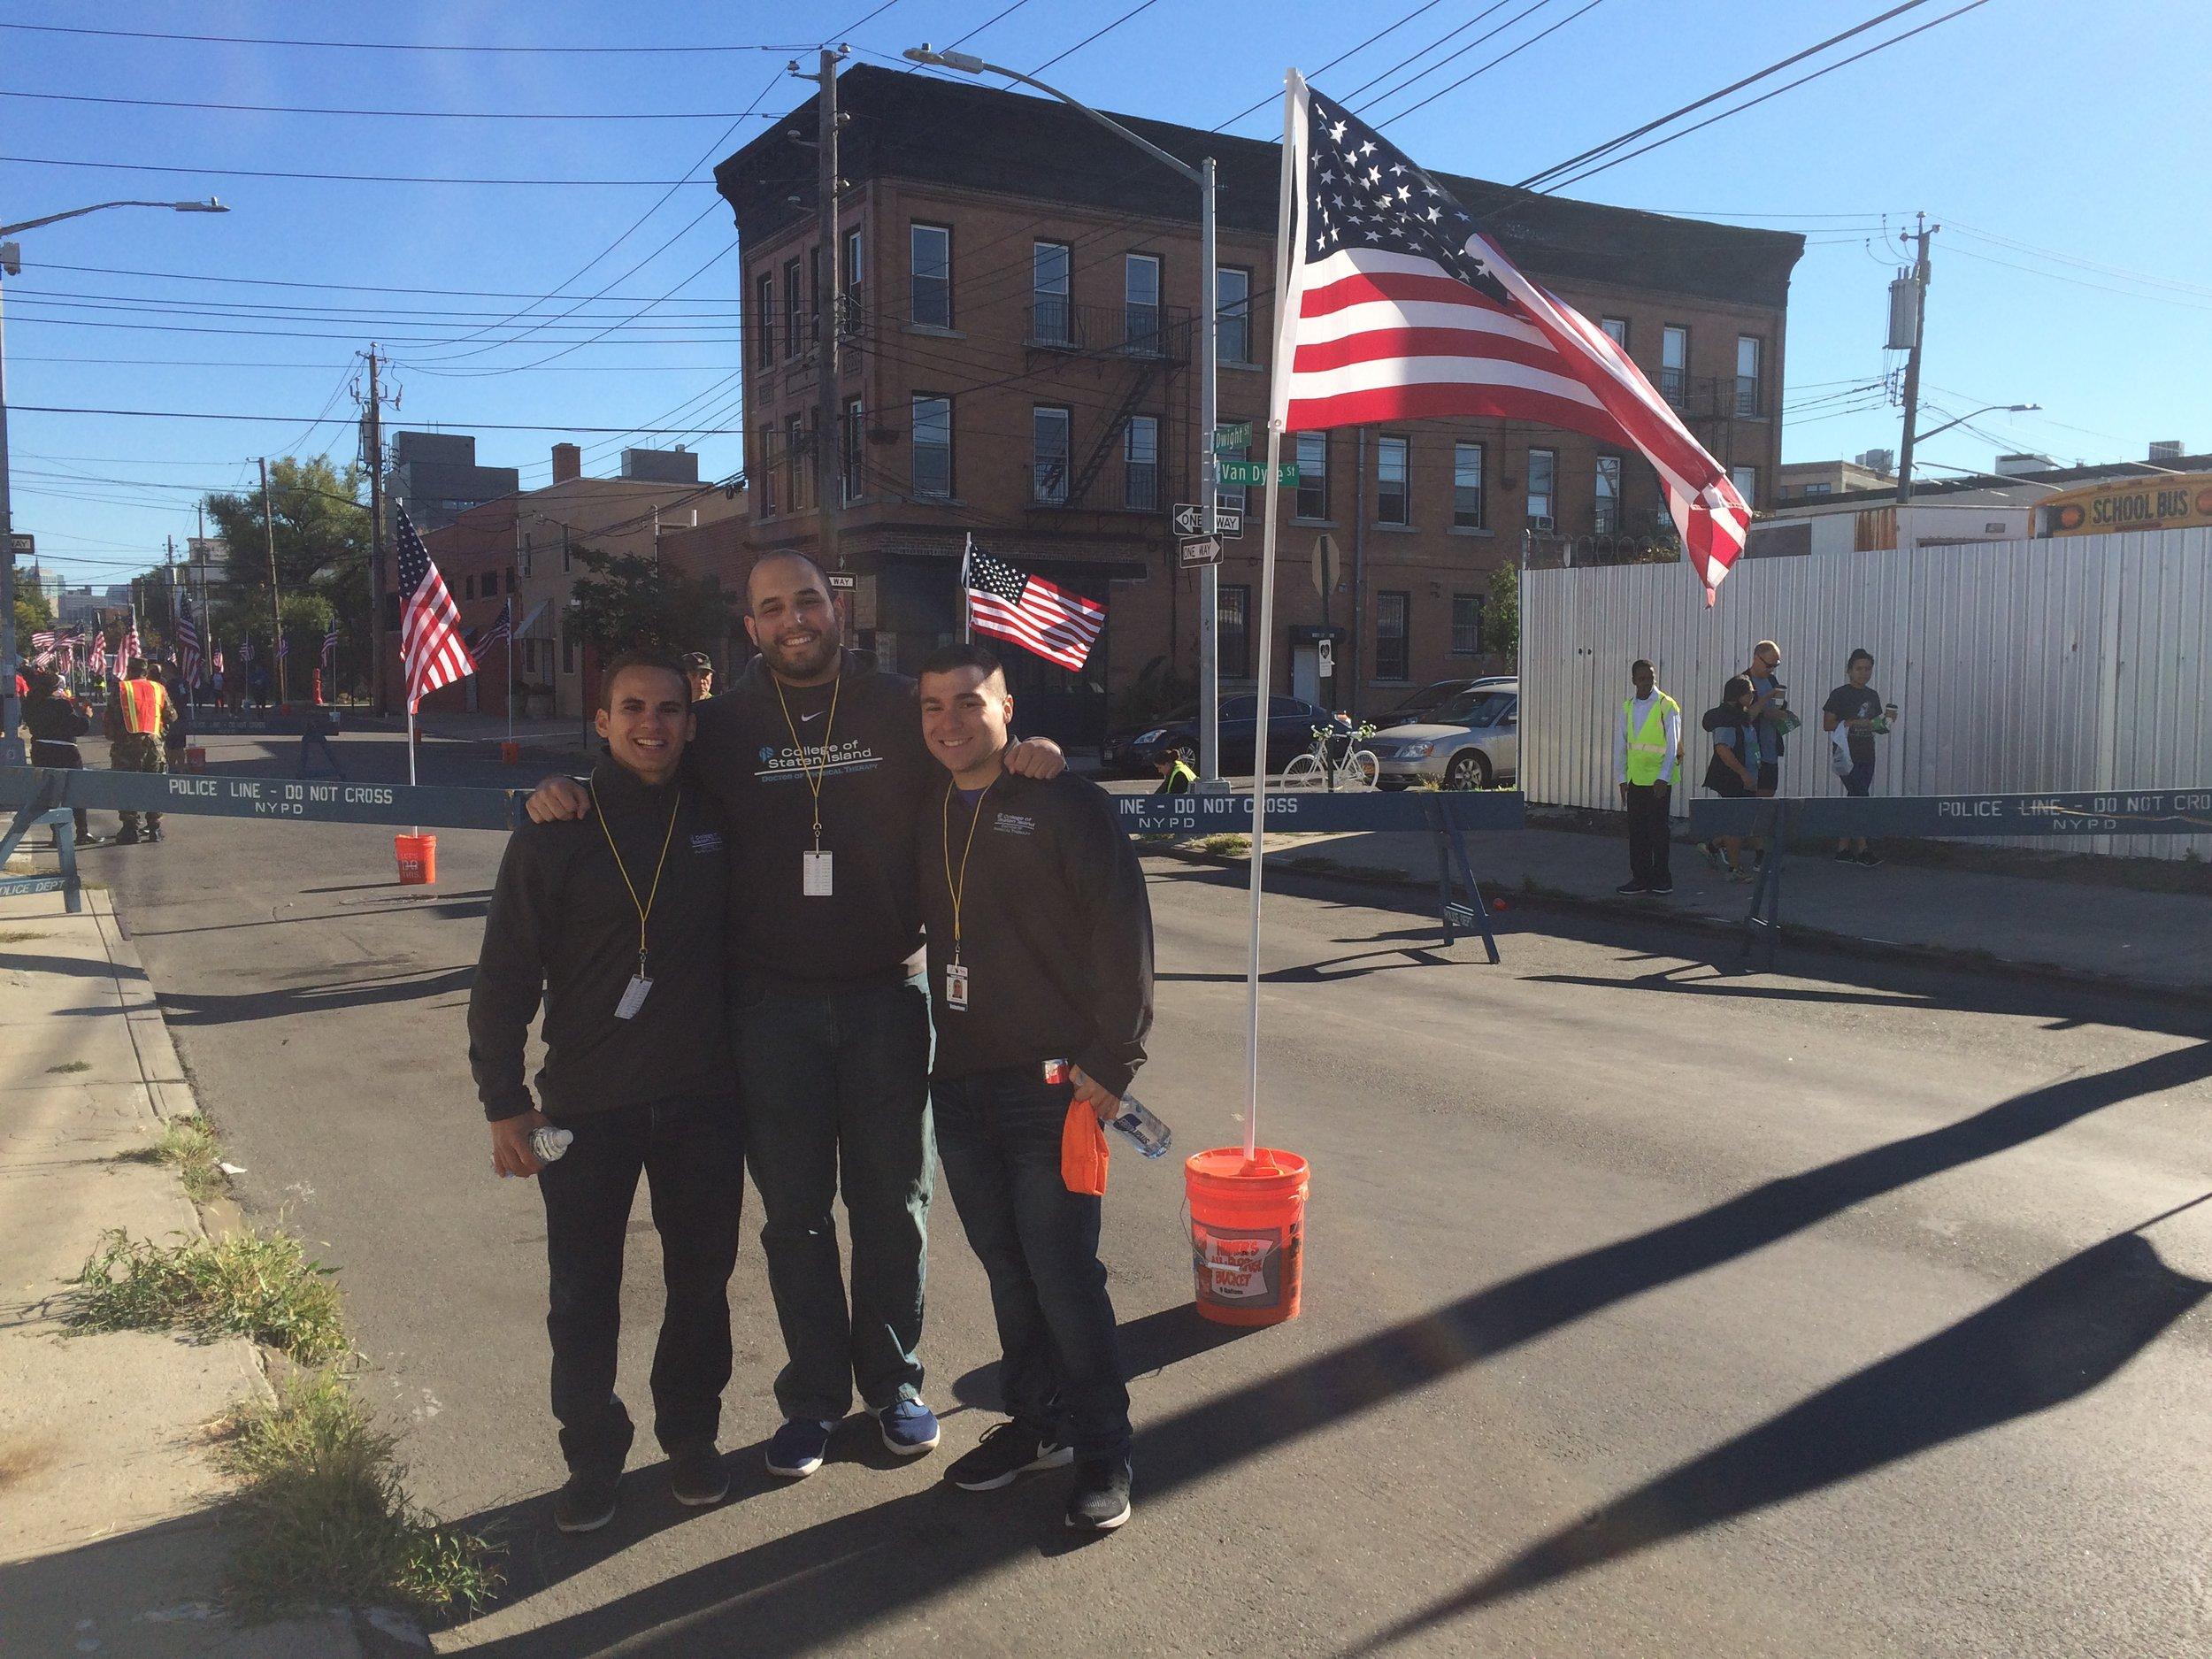 College of Staten Island students: Thomas Mandala, Munir Bouzid, and Joseph Guarini (left to right) at the race.